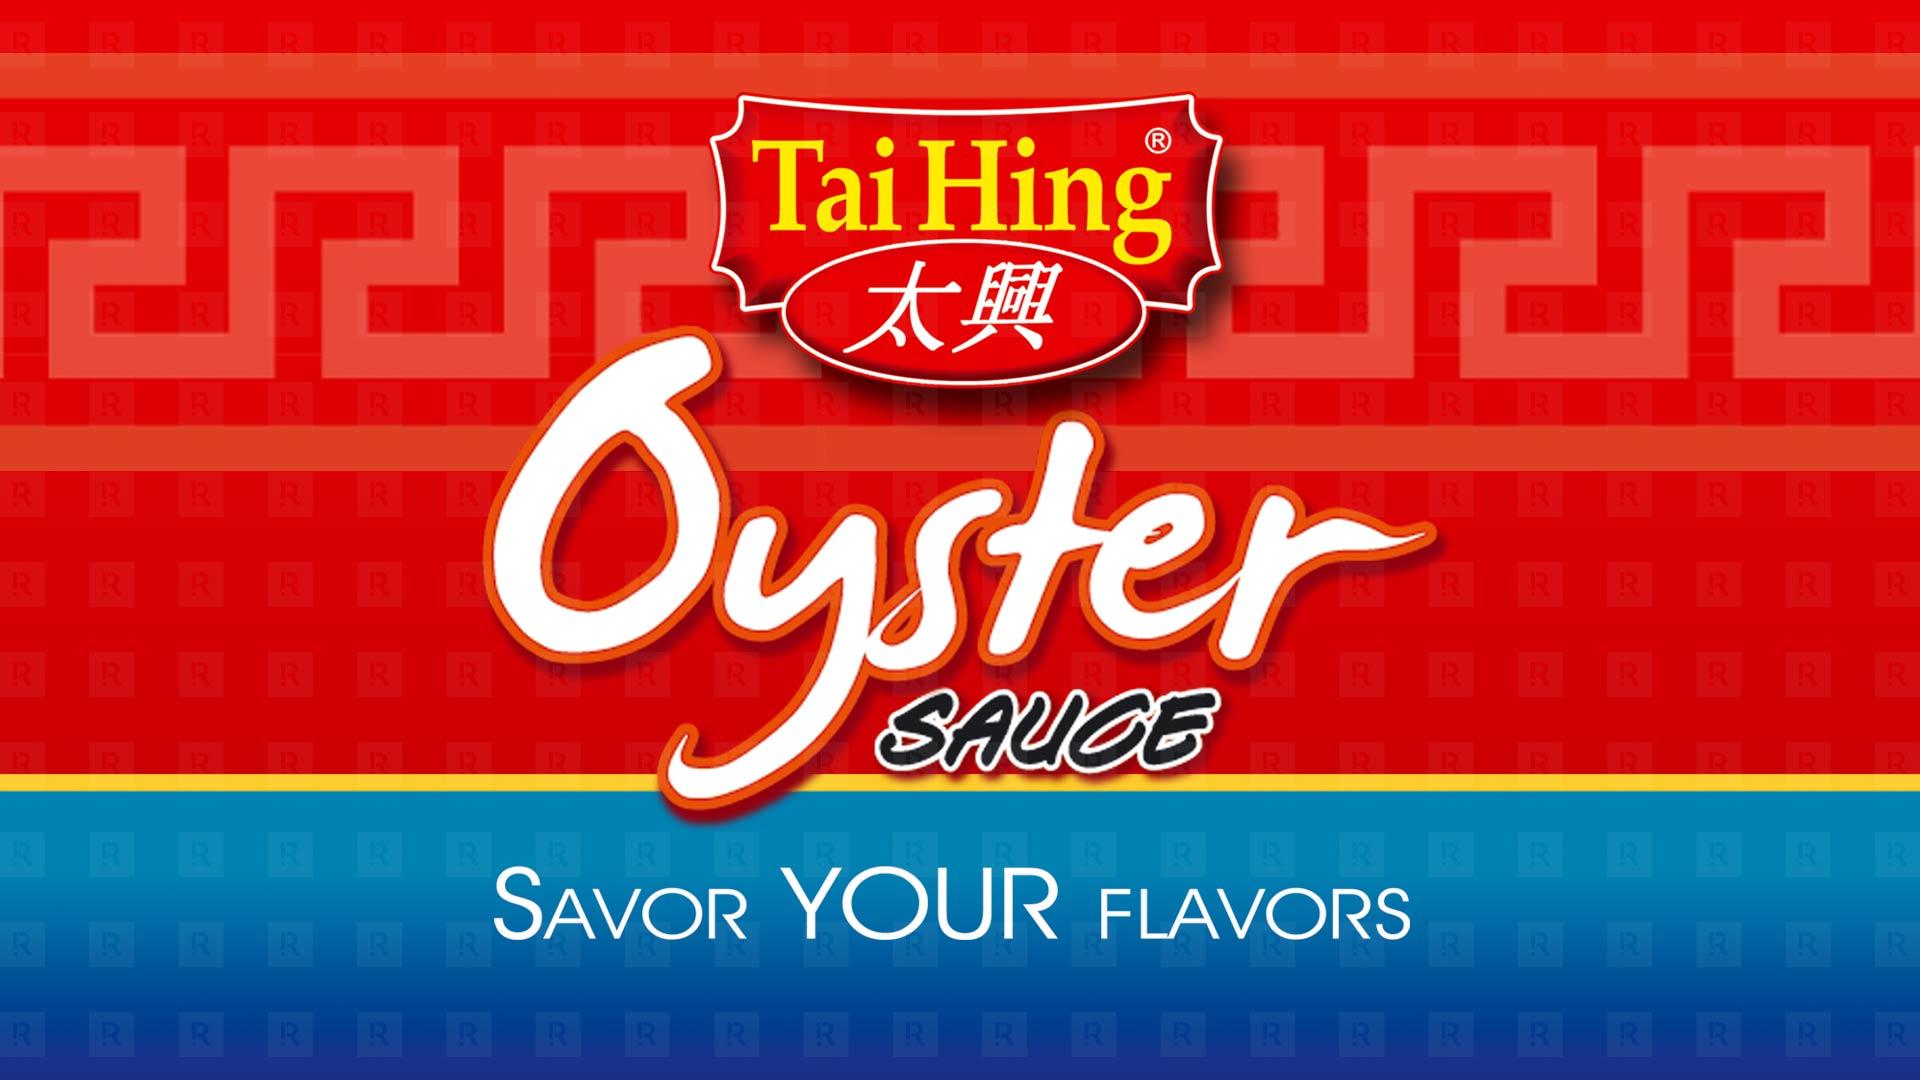 Tai Hing Oyster Sauce Brand Design